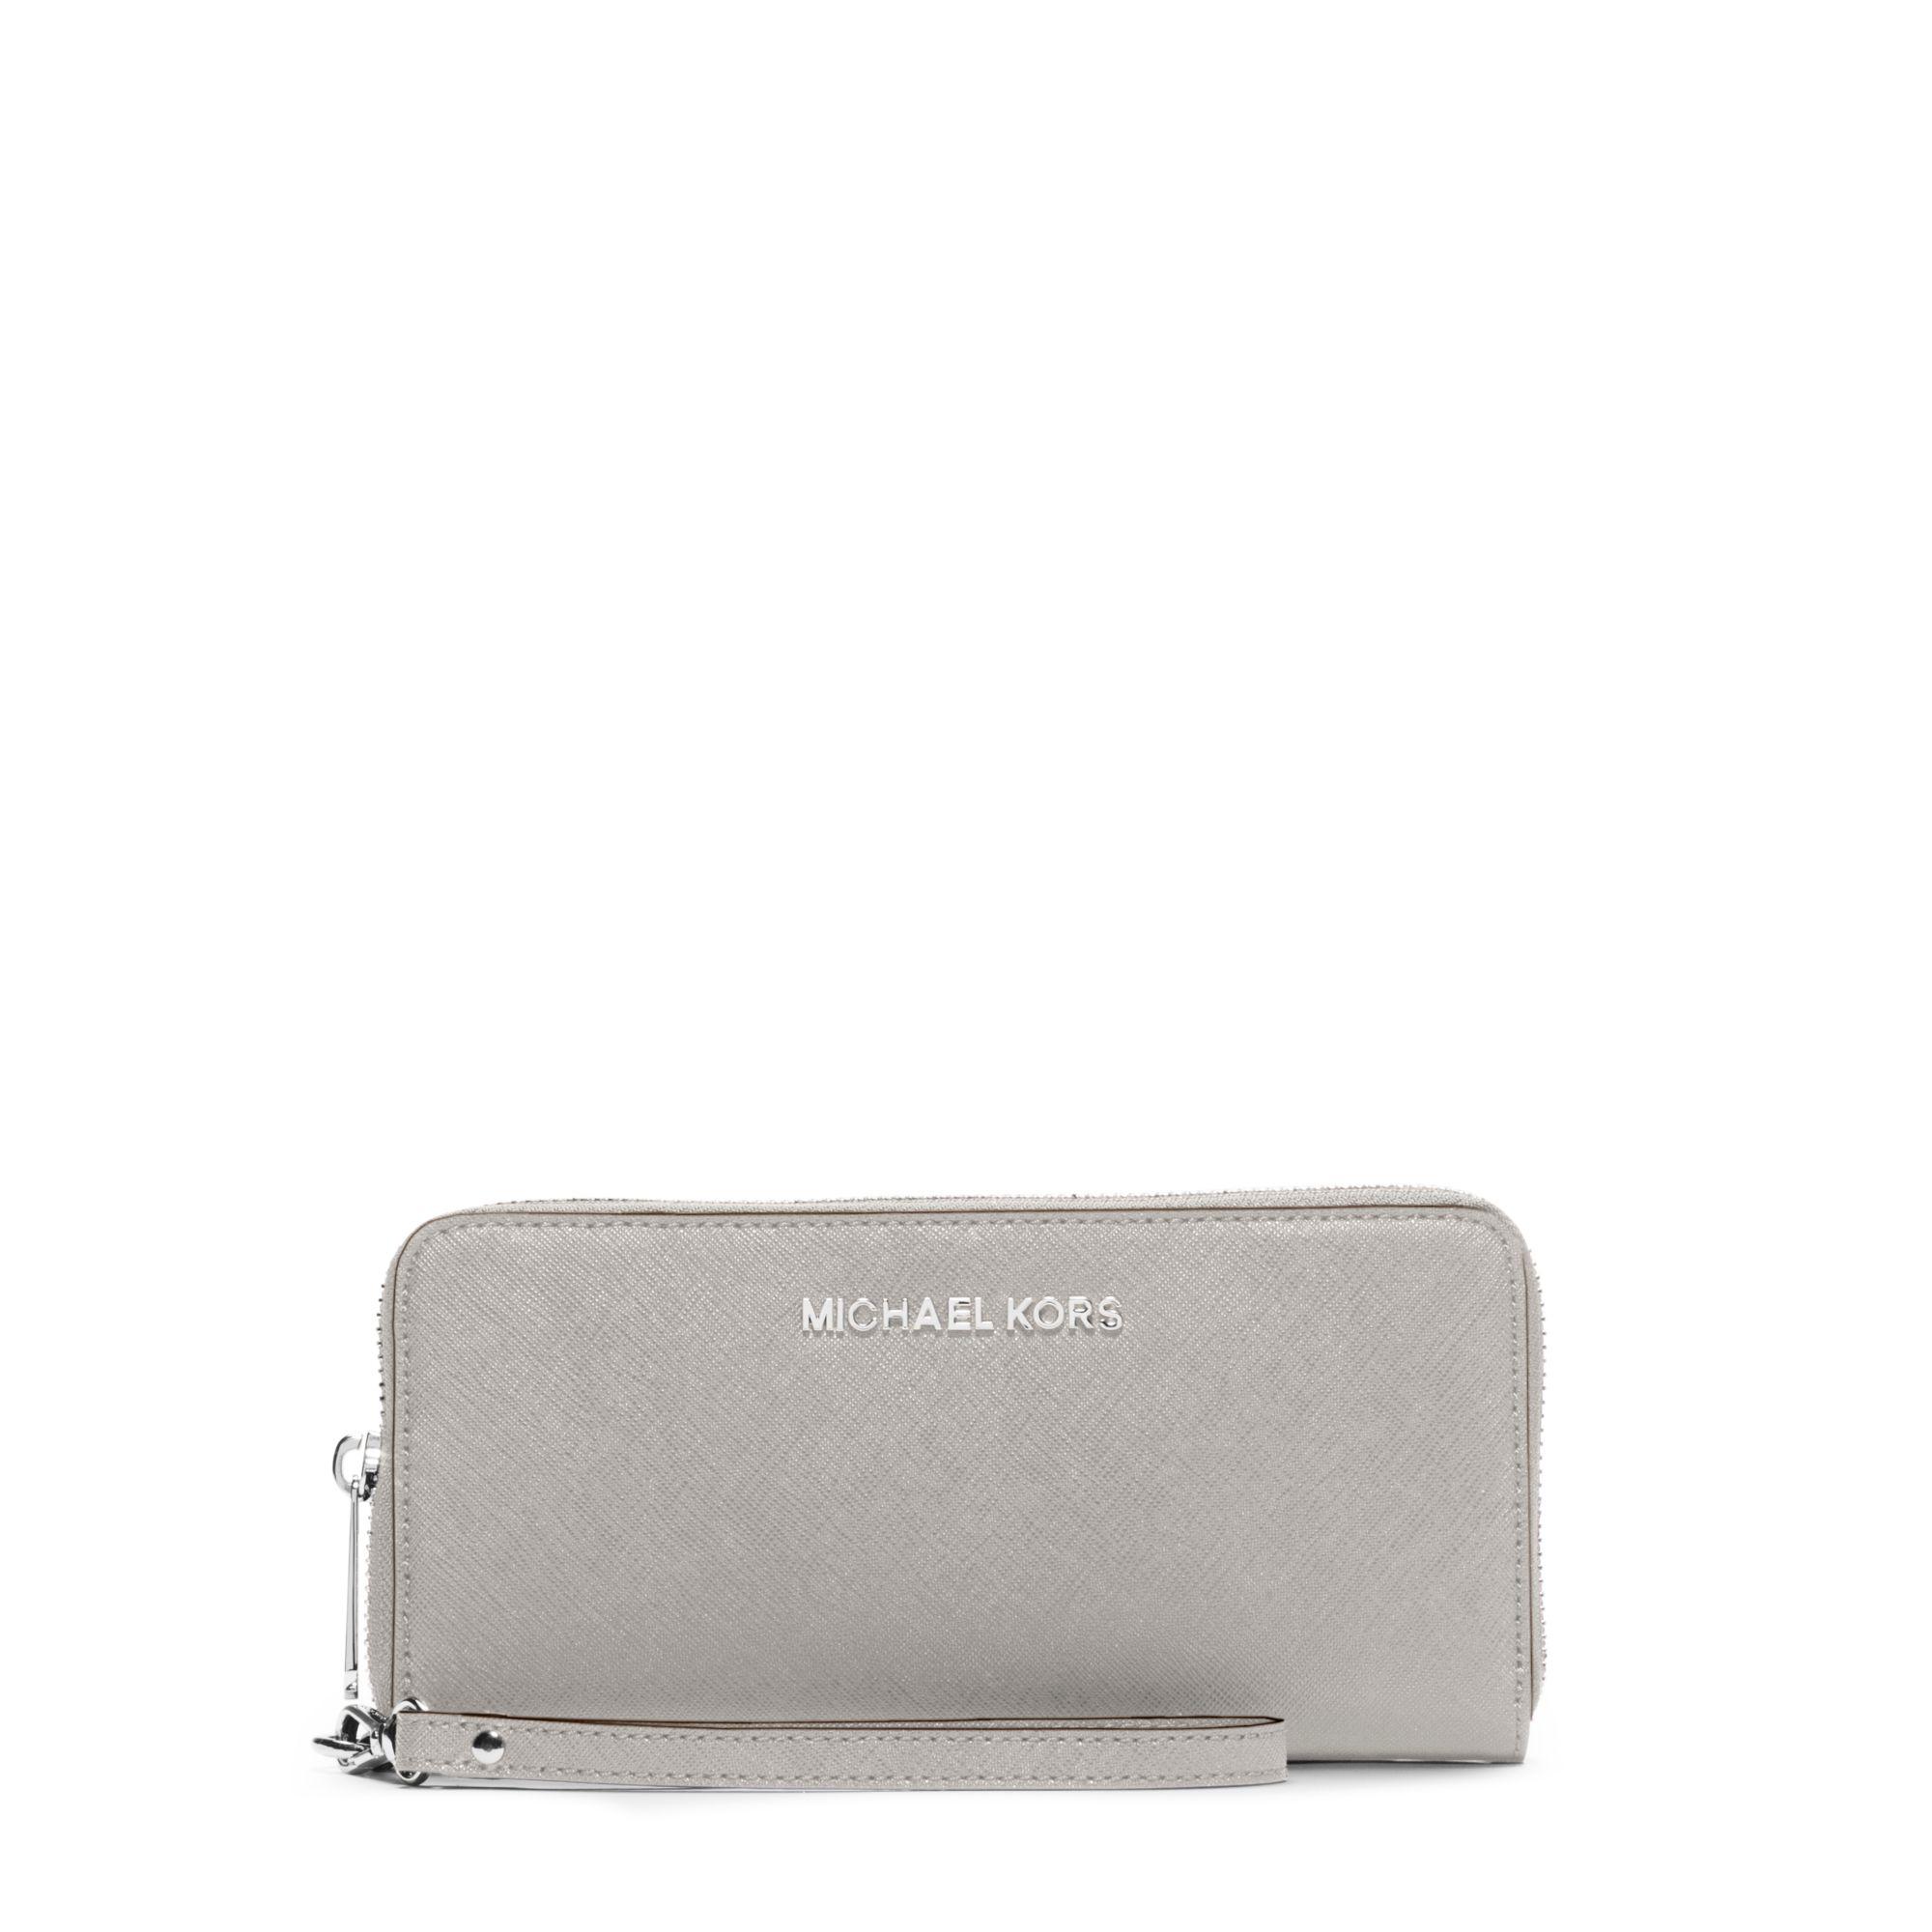 02cbd63bfe71 ... Continental Wallet Gray🎉 Michael kors Jet Set Travel Large Saffiano  Leather Smartphon ...